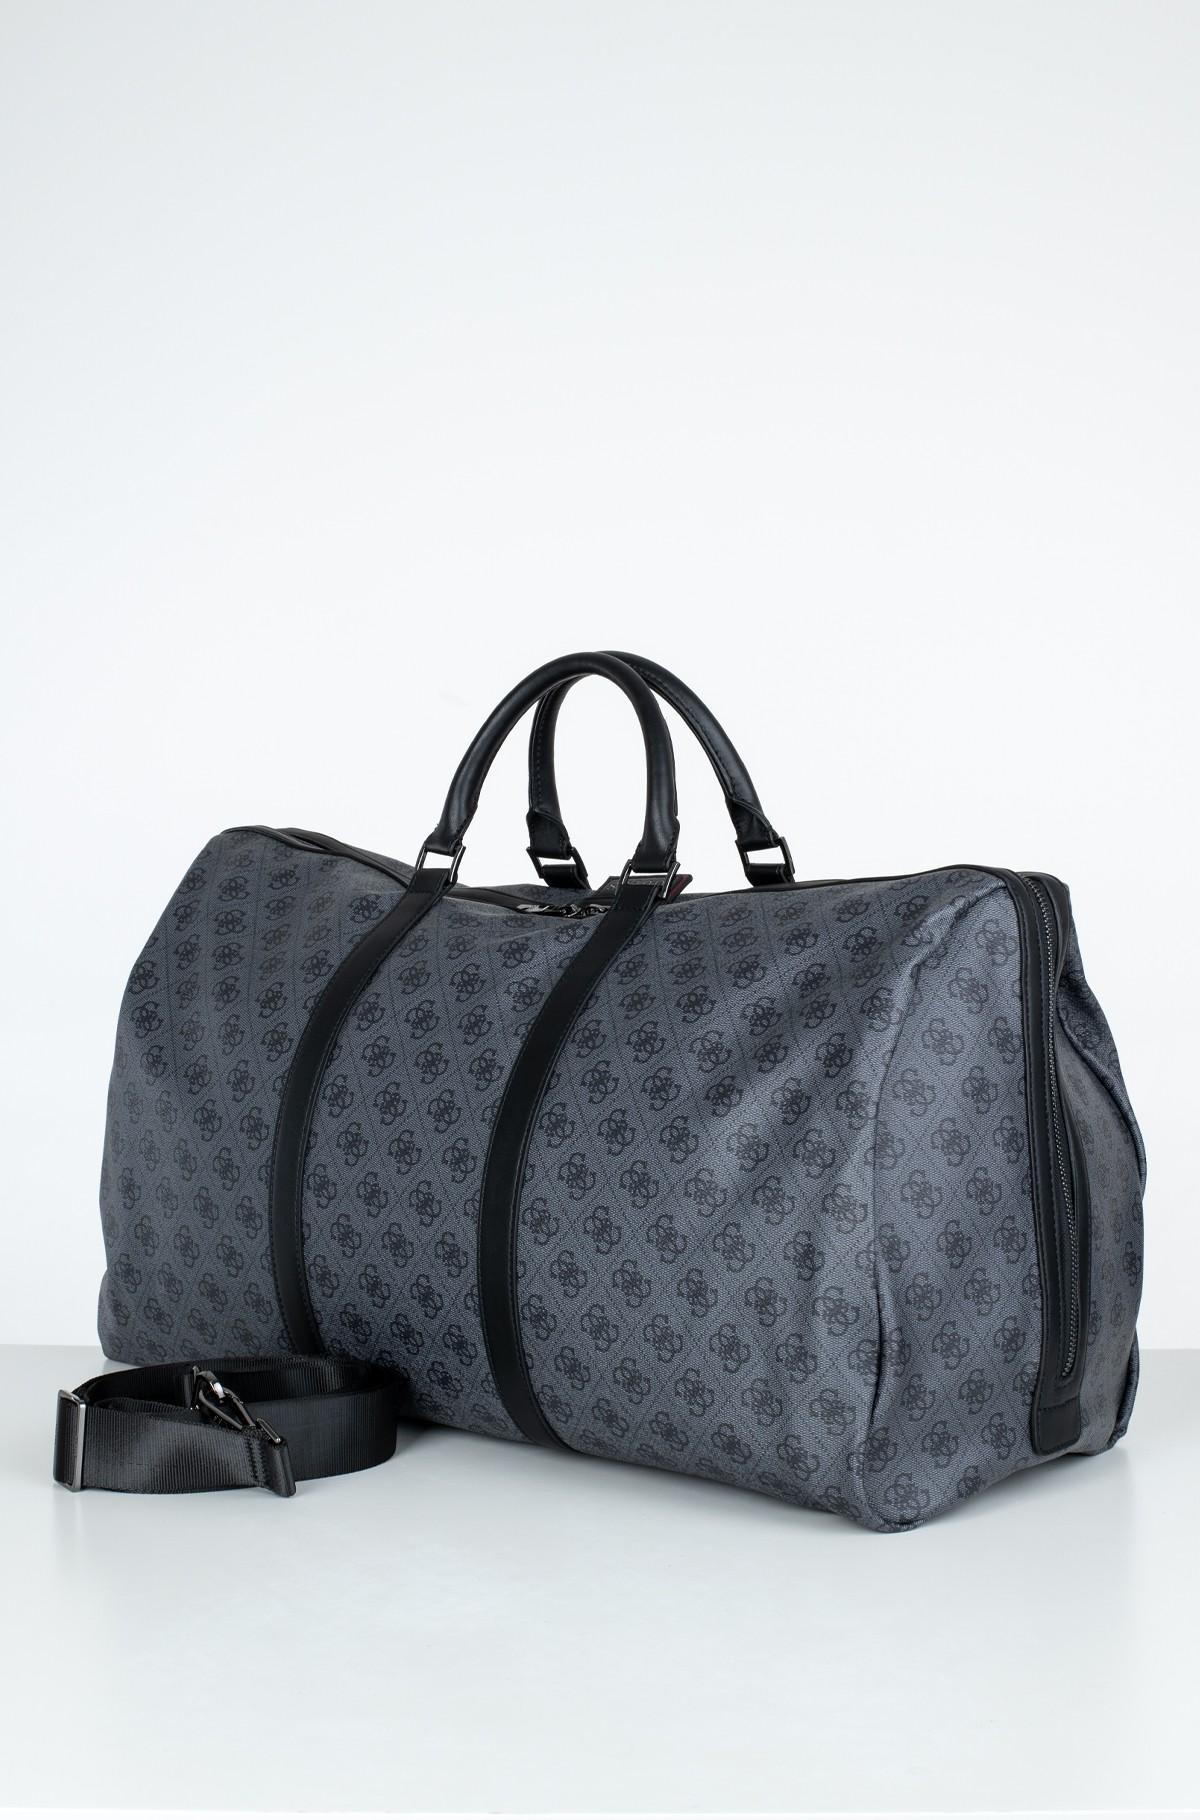 Travel bag  TMVEZL P1135-full-4